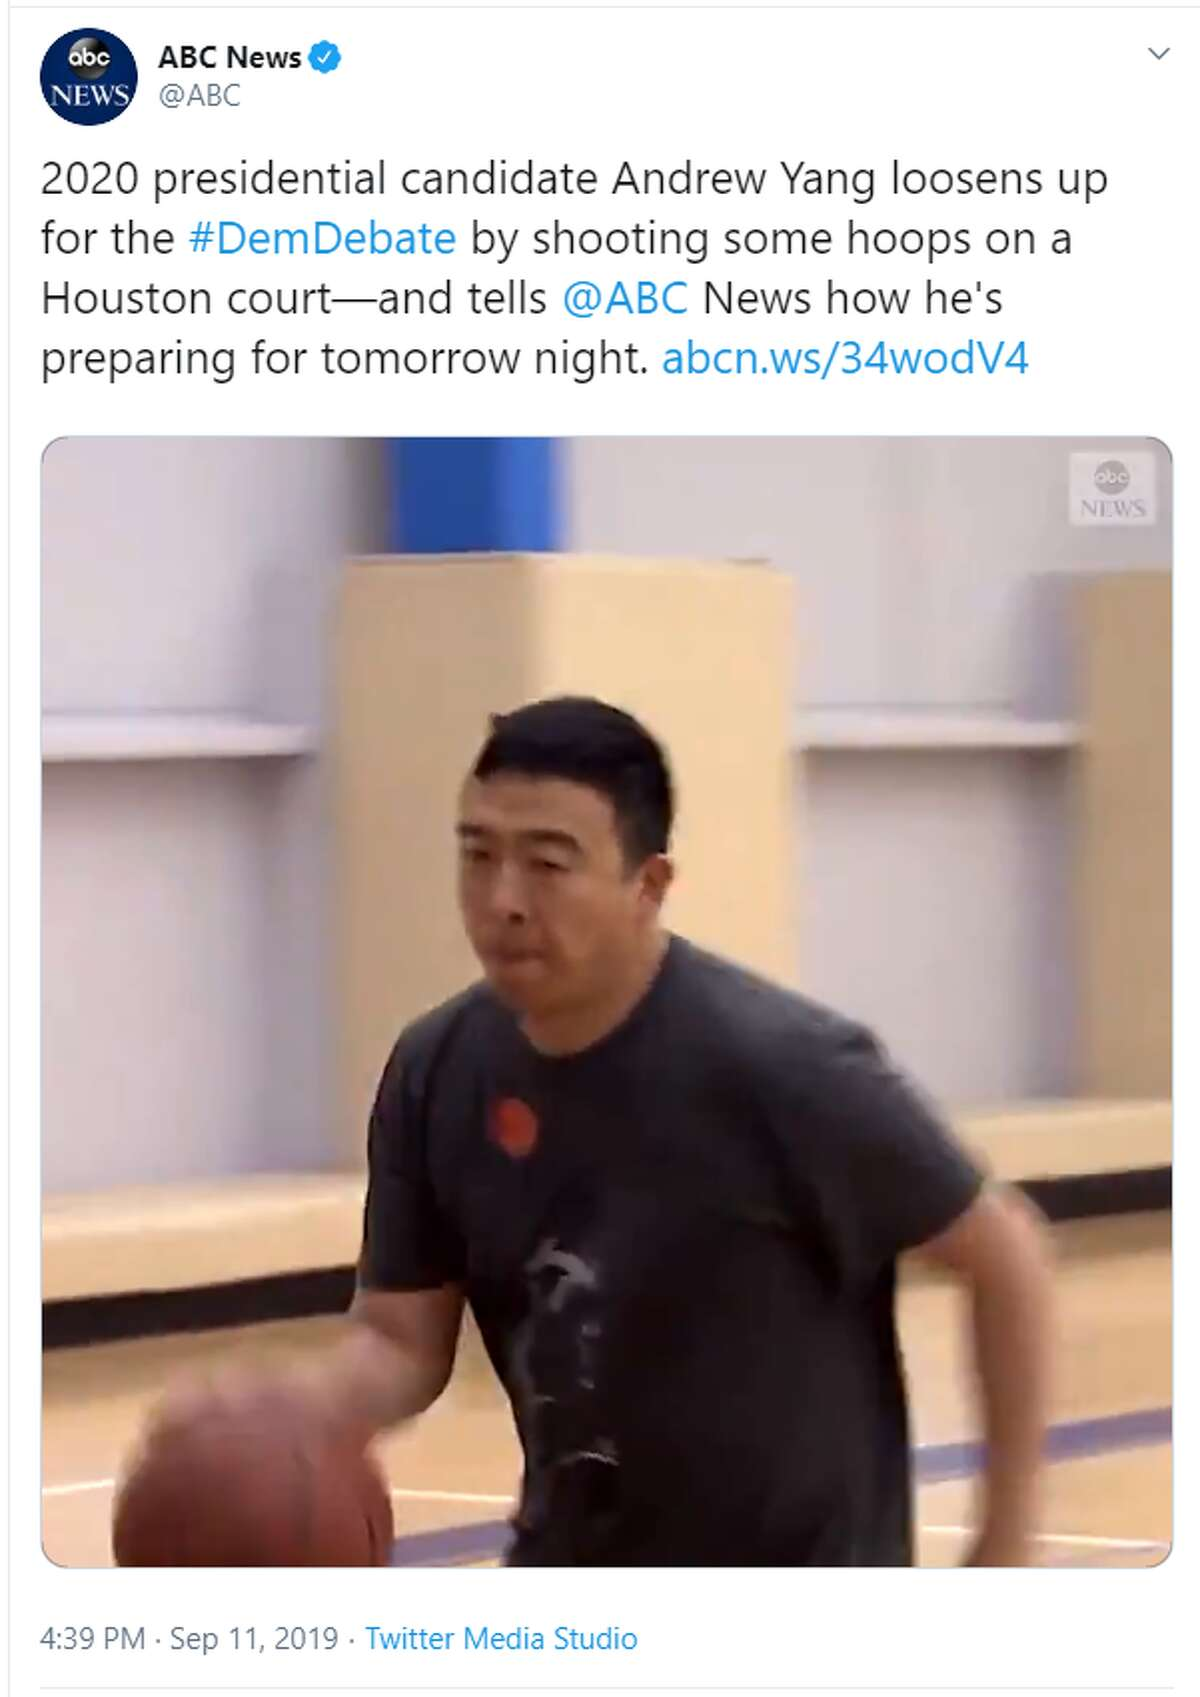 @ABCNews